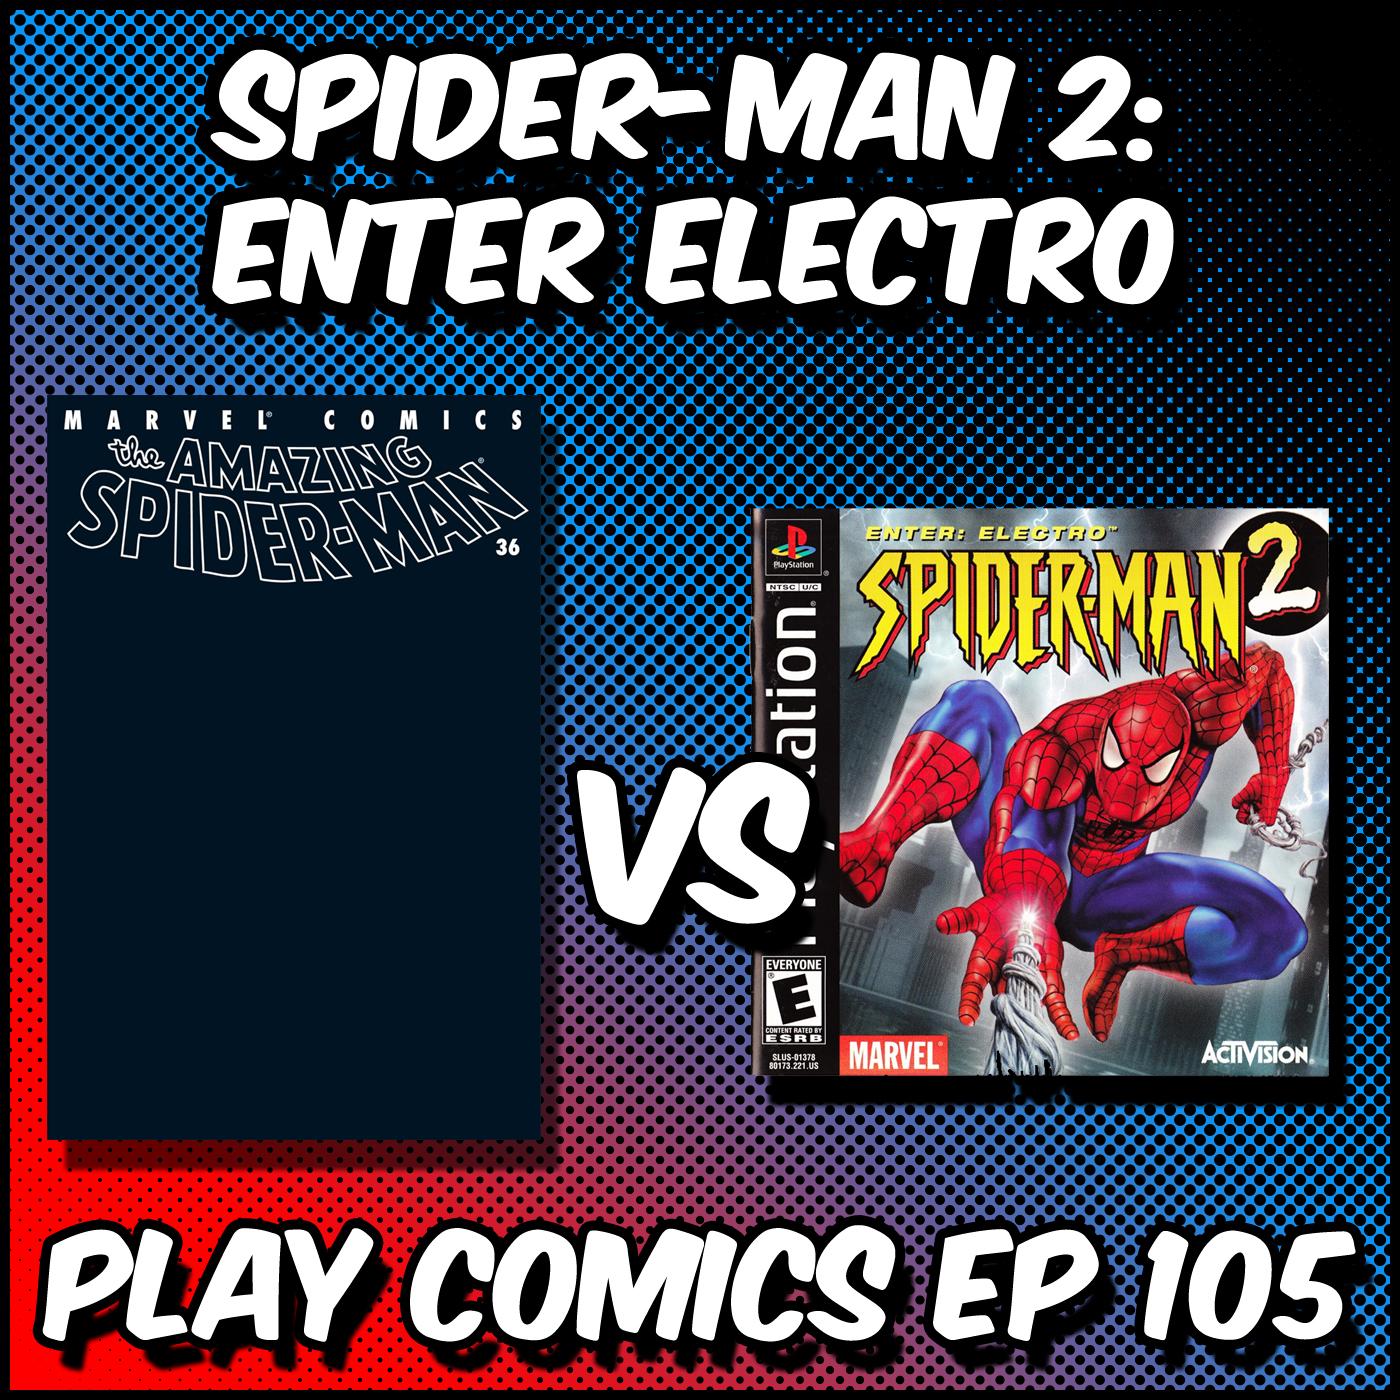 Spider-Man 2 Enter Electro with Anthony Gramuglia